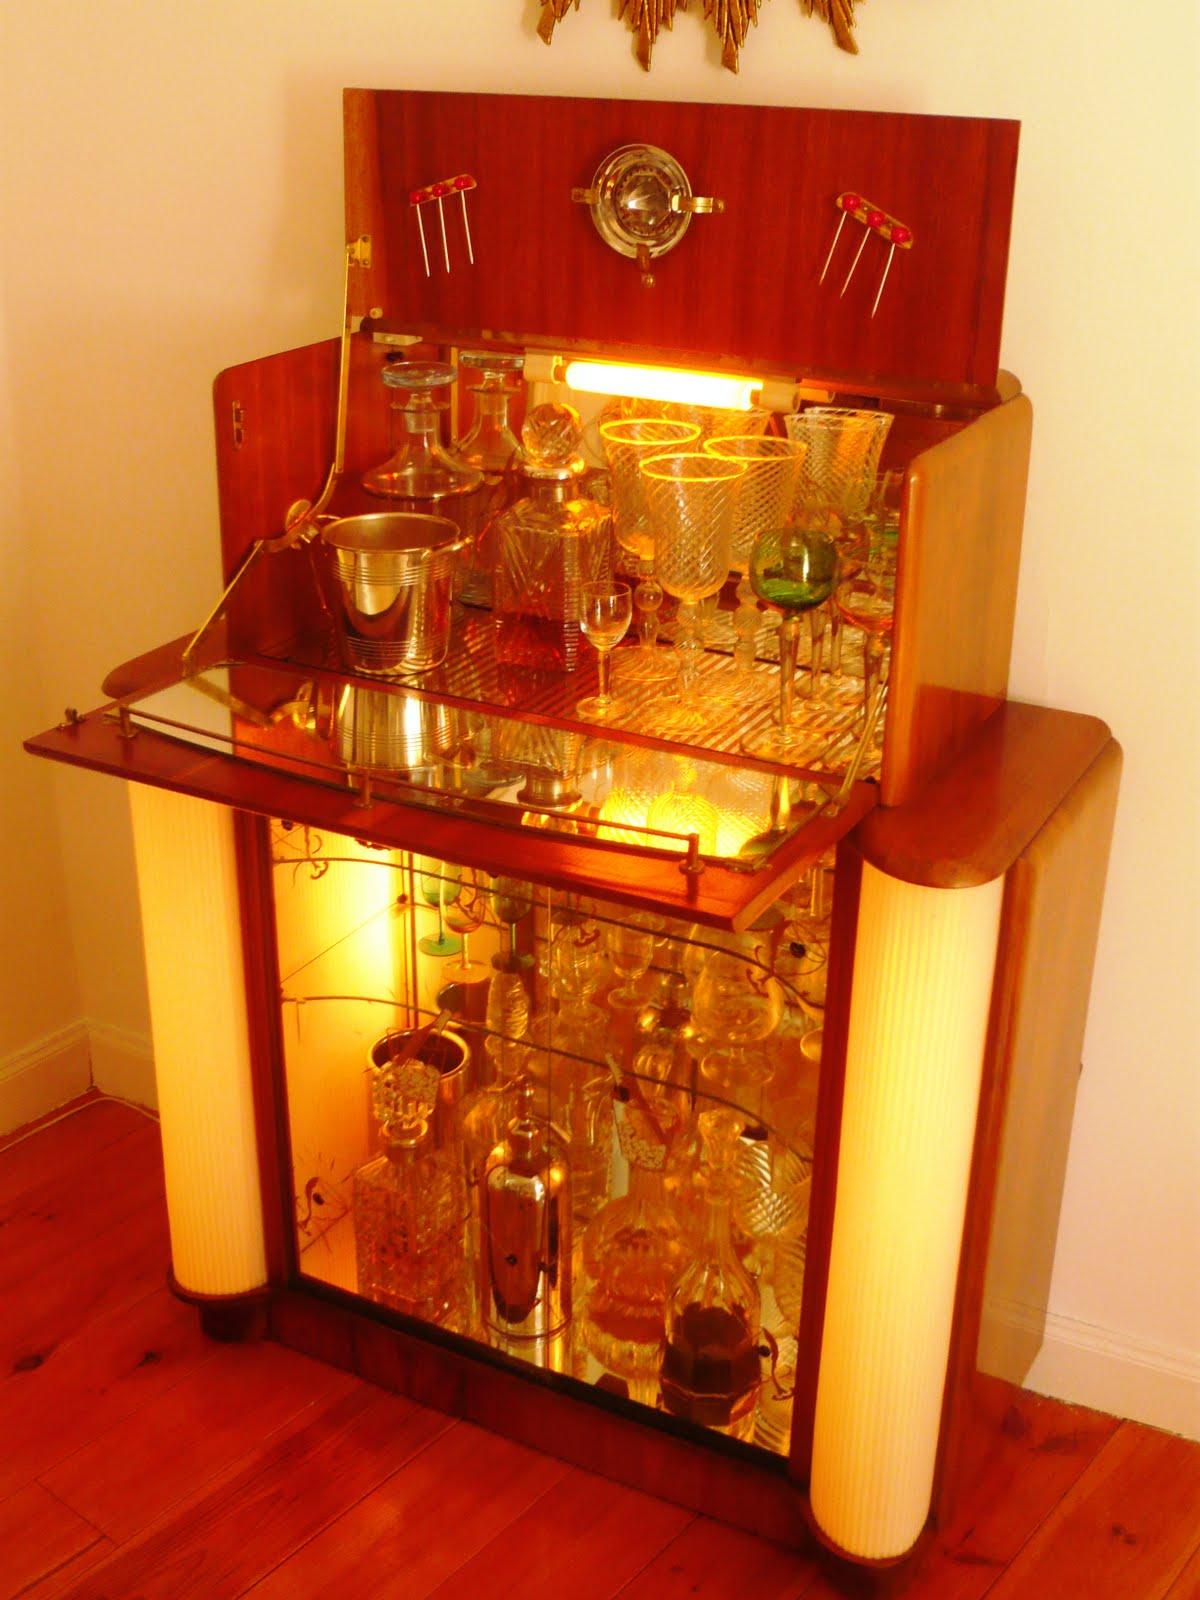 Mueblebar mueble cocktail ingl s a os 50 - Muebles de epoca ...